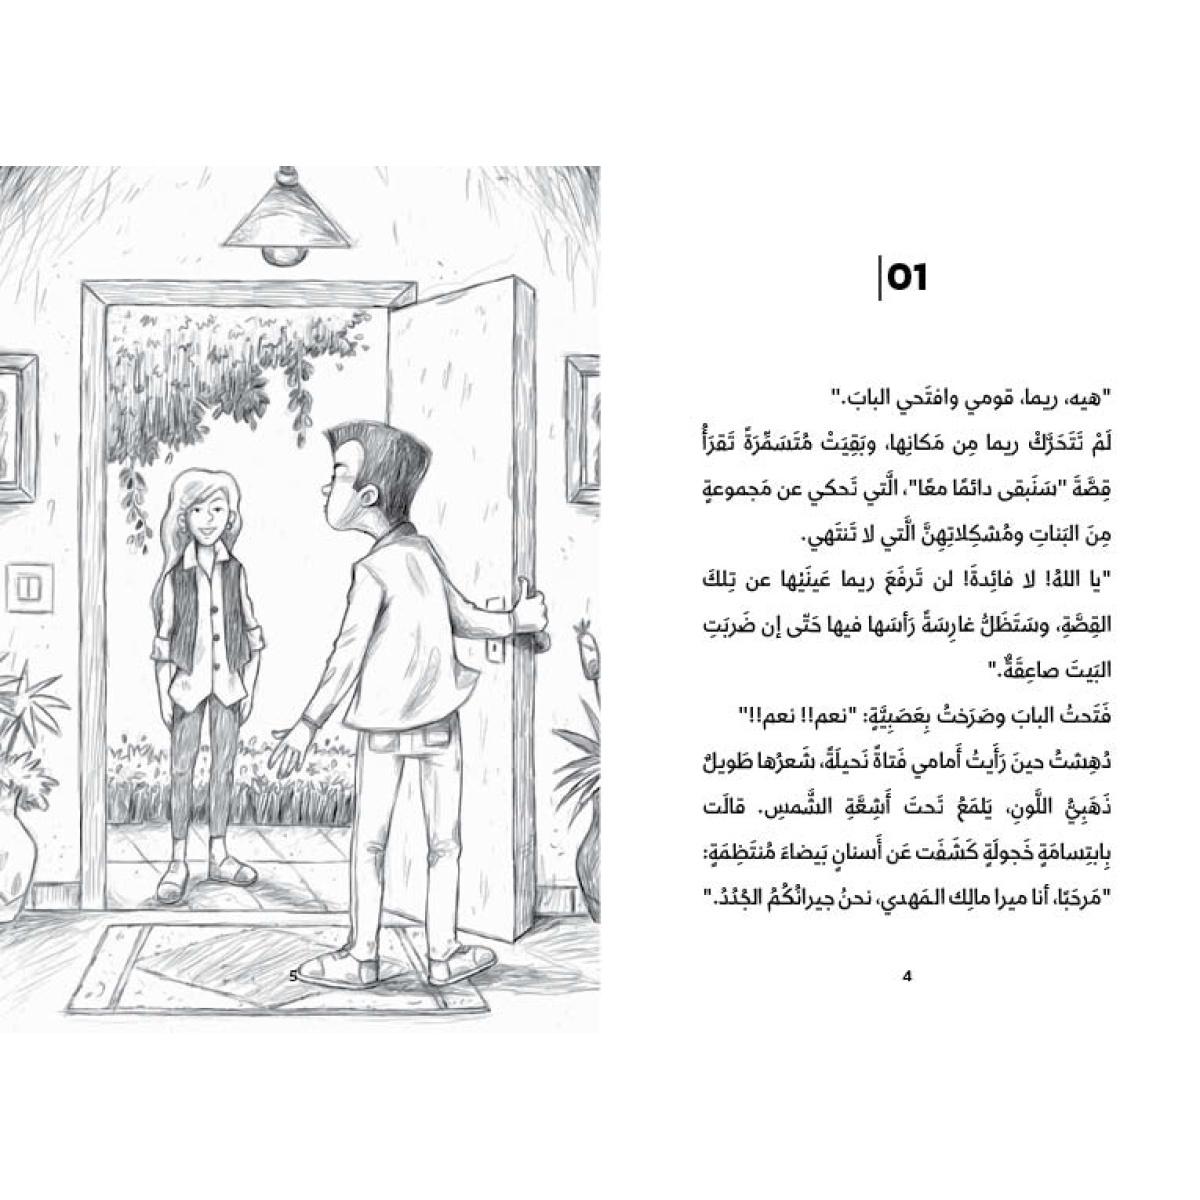 Ahmad Akkad The Haunted House Spread Dar Al Yasmine Publishing and Distribution